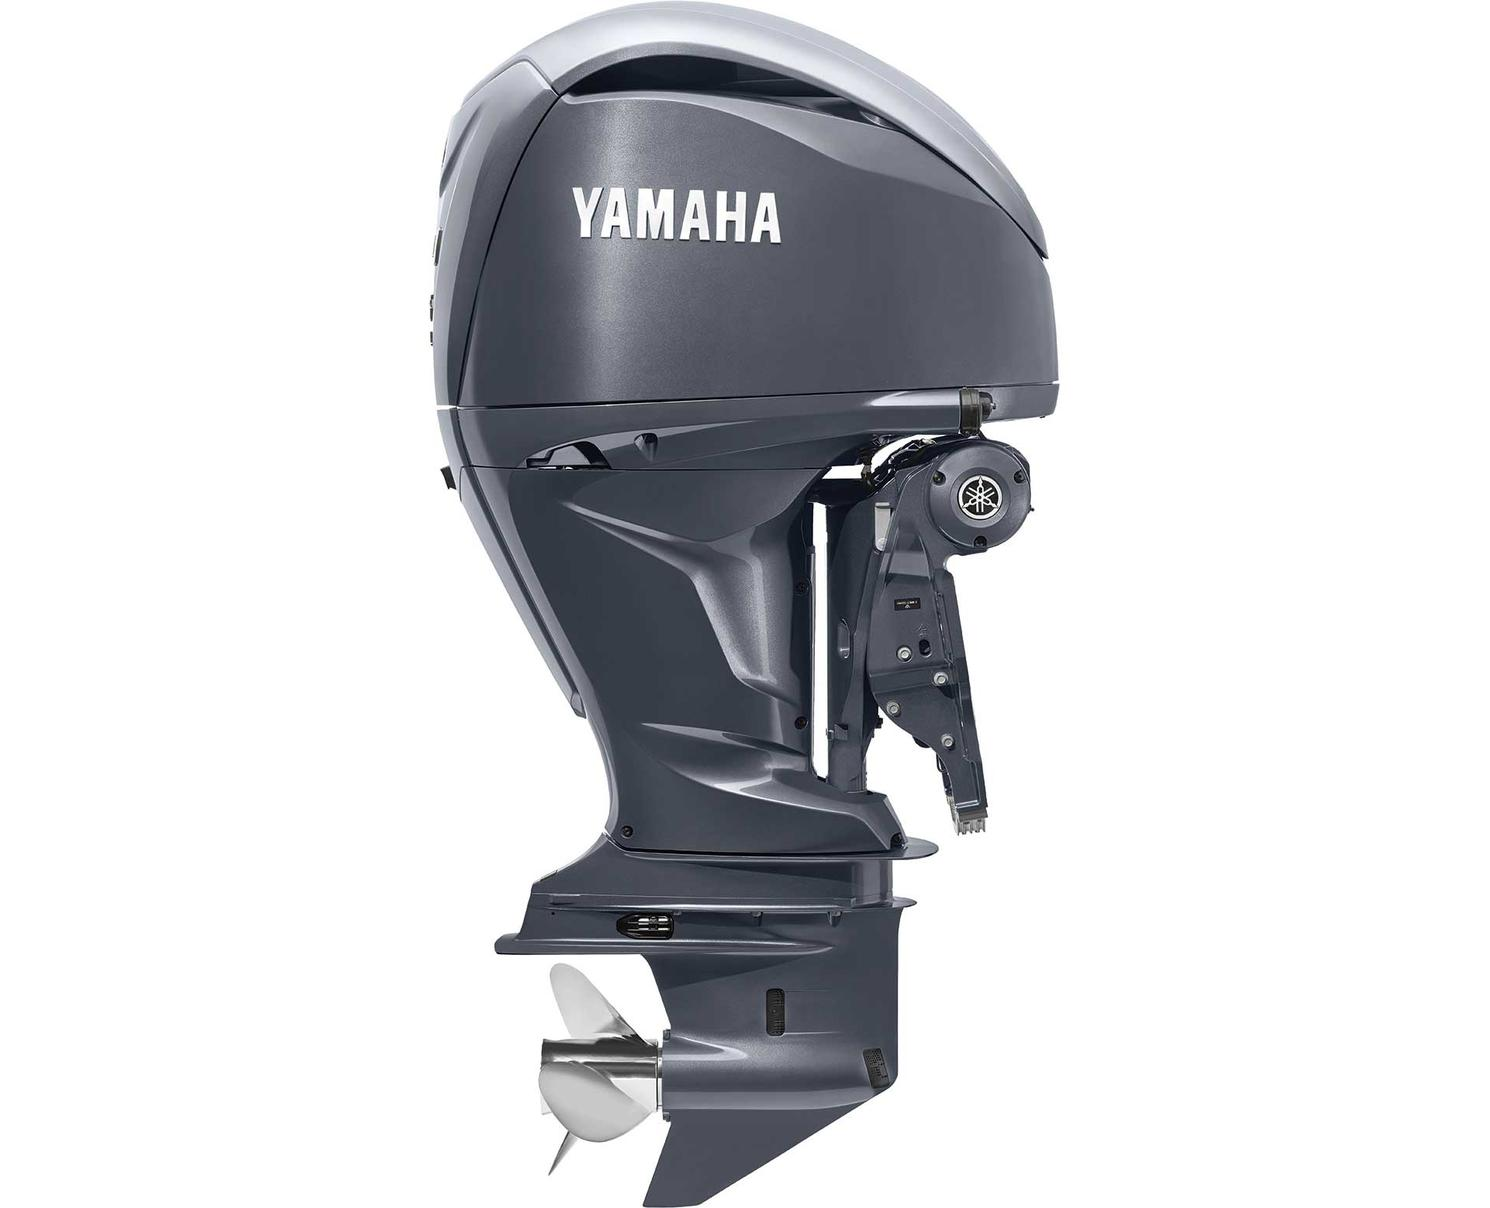 Yamaha F300B Noir/Gris 2021